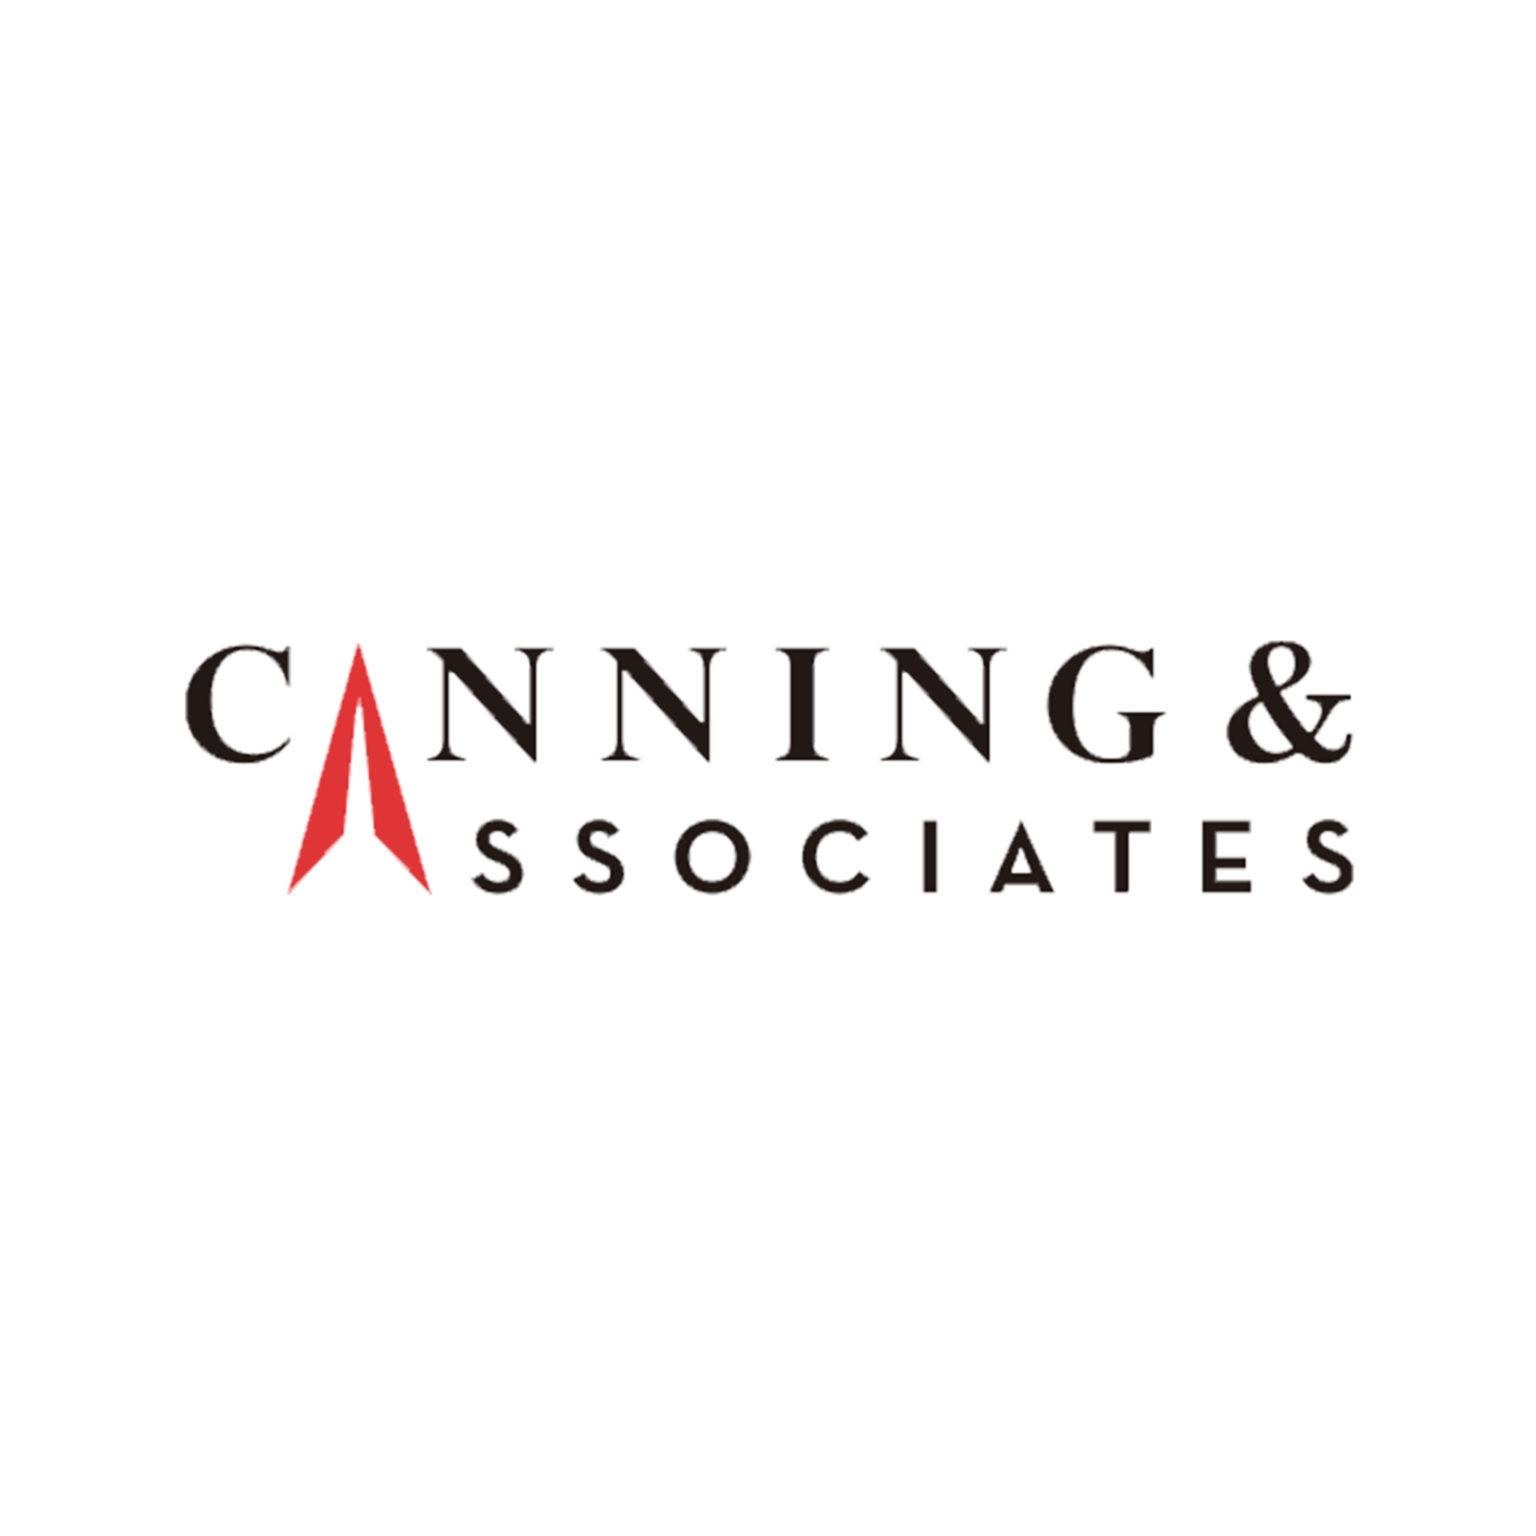 canning & associates logo